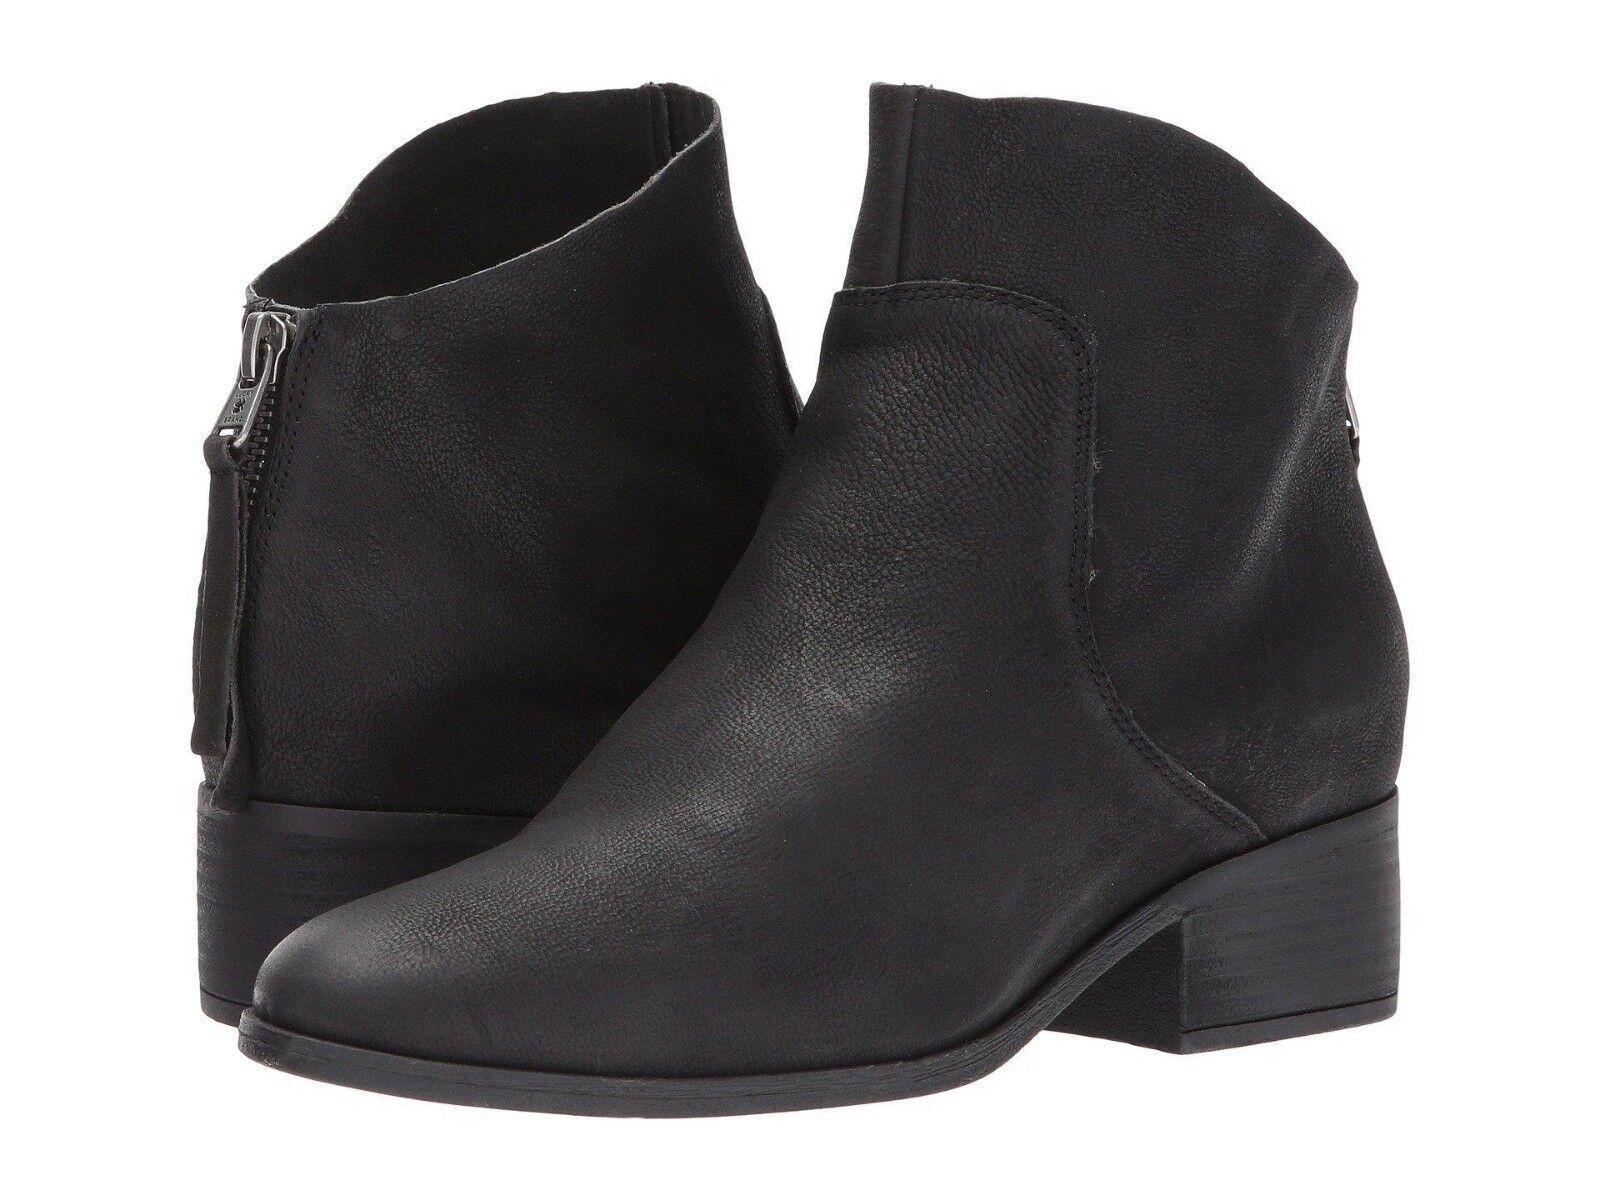 Lucky Brand Lahela avvioIES nero LEATHER stivali scarpe Bridgetown Dimensione 5.5 M -New-